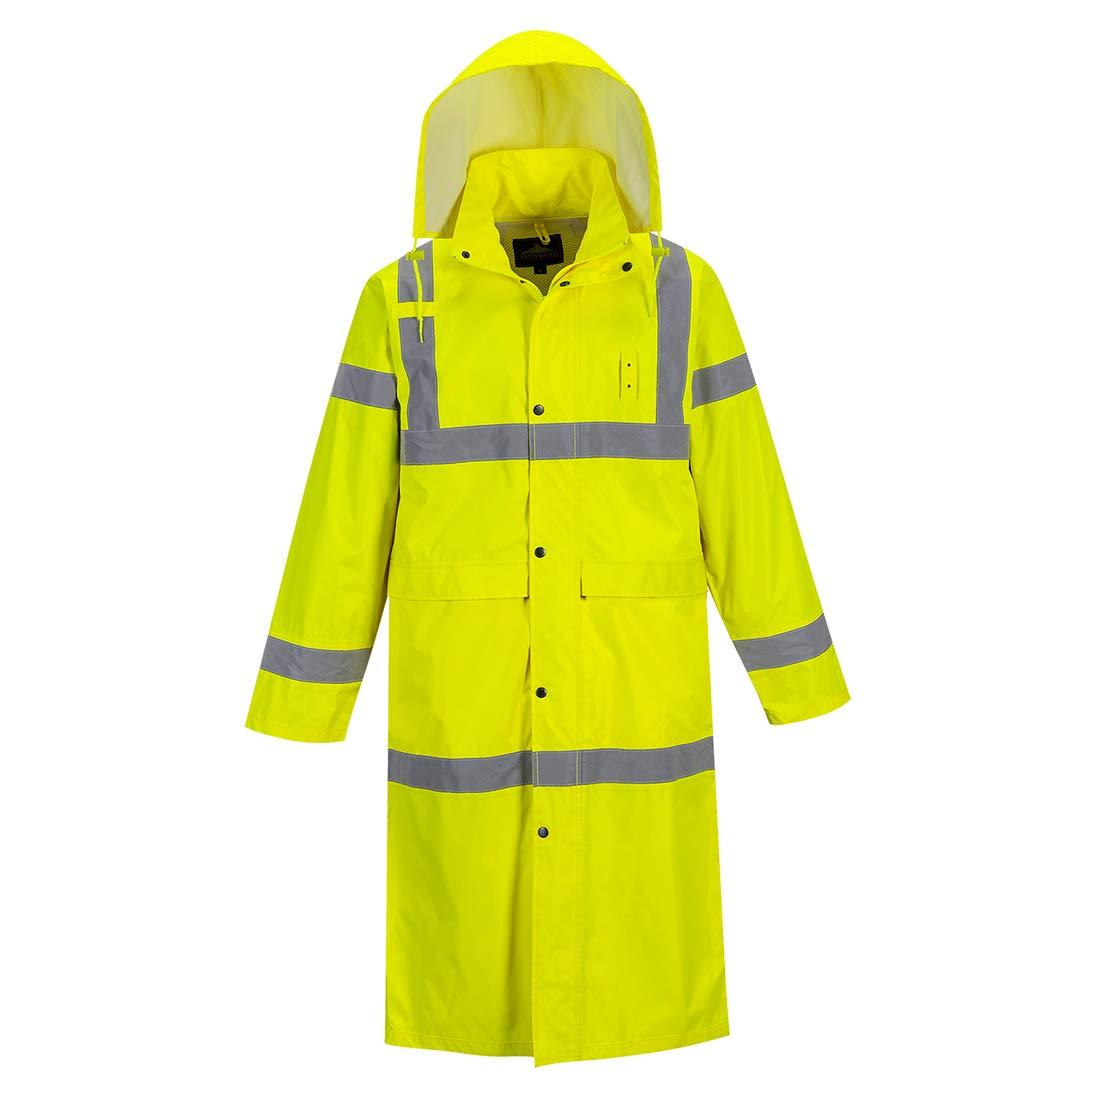 Portwest UH445YER5XL Hi-Vis Classic Raincoat 48, 5X-Large, Yellow by Portwest